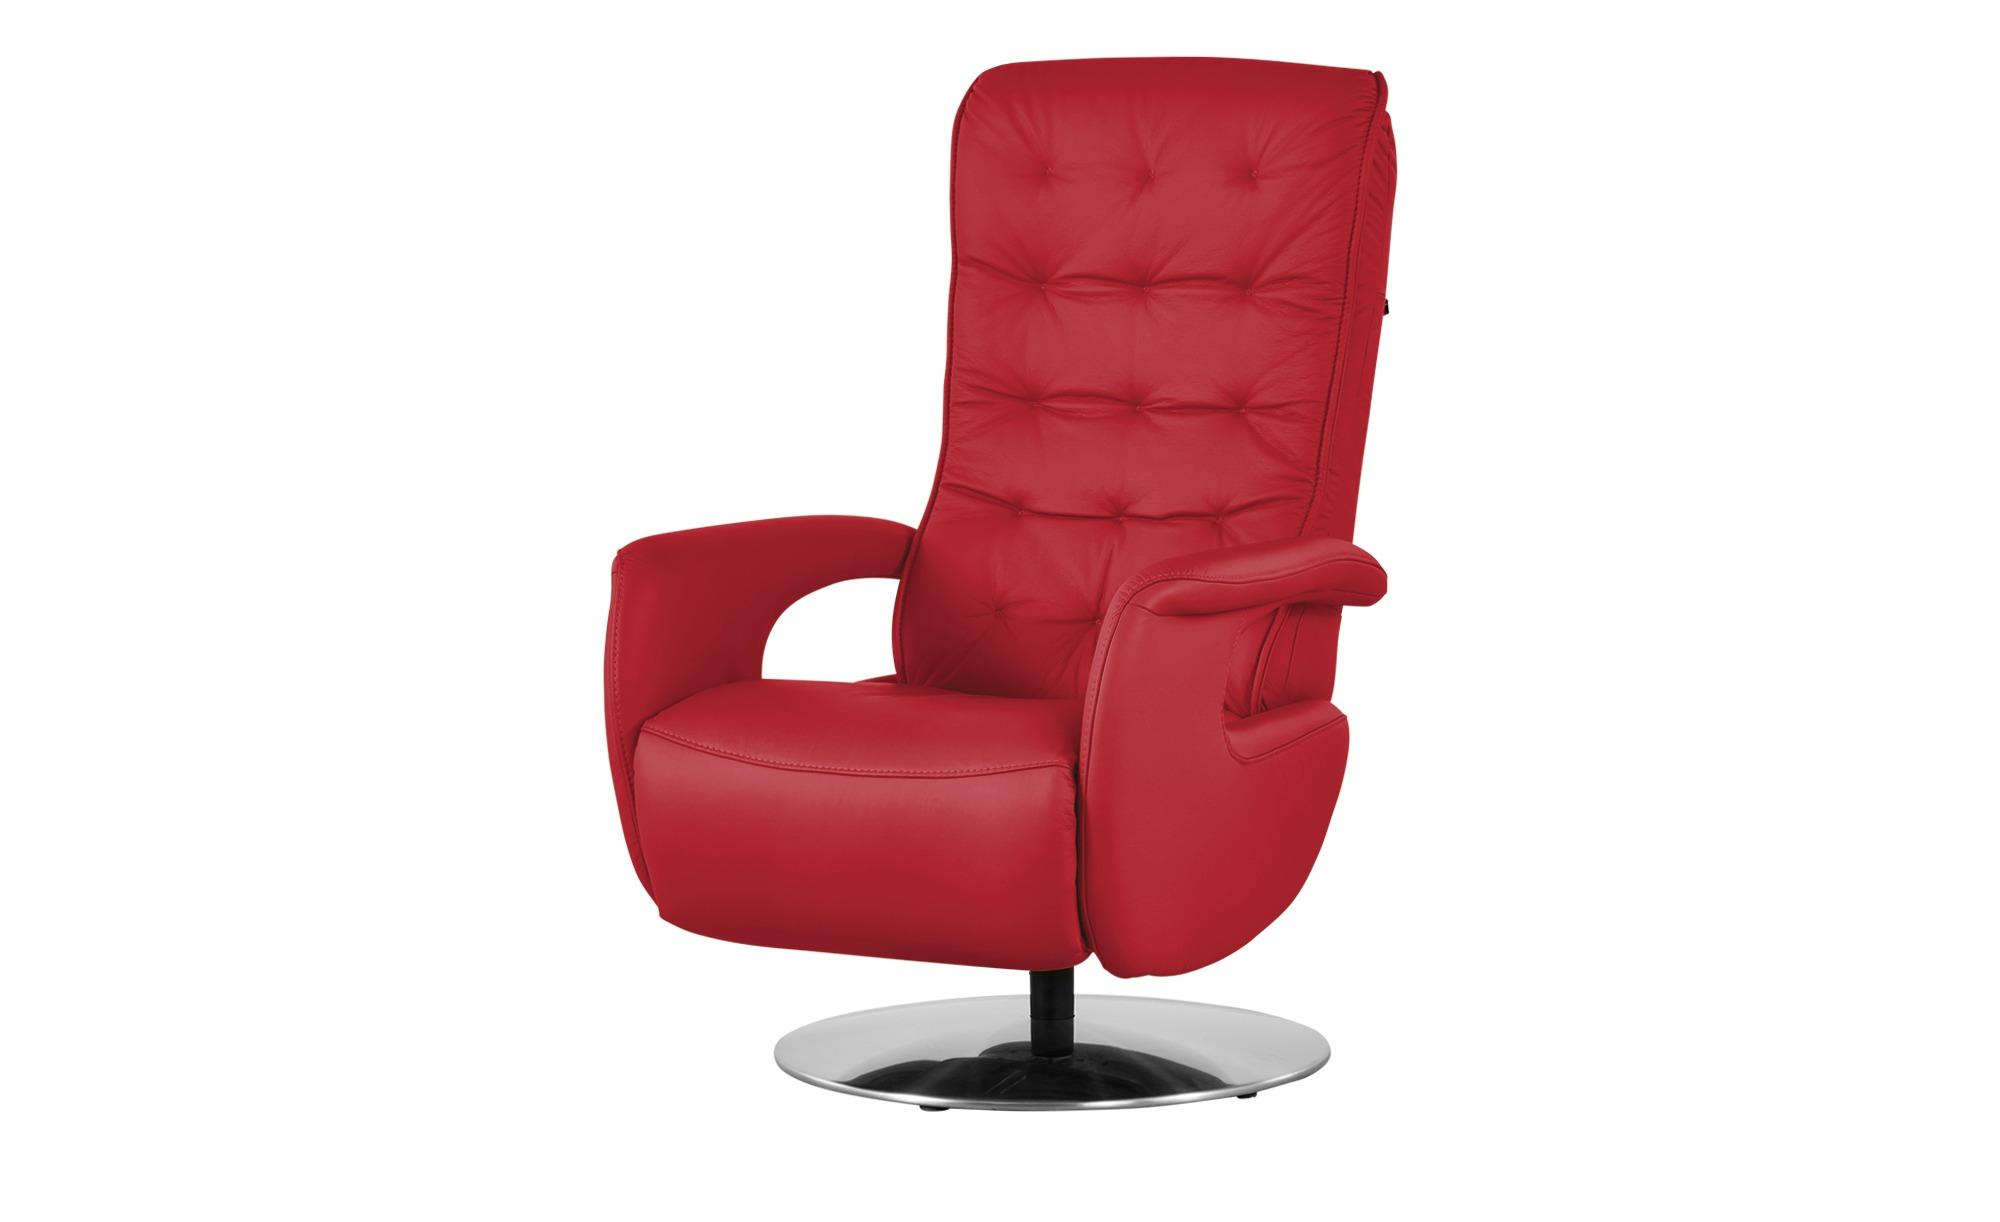 Hukla Relaxsessel  Smilla ¦ rot ¦ Maße (cm): B: 72 H: 113 T: 83 Polstermöbel > Sessel > Ledersessel - Höffner